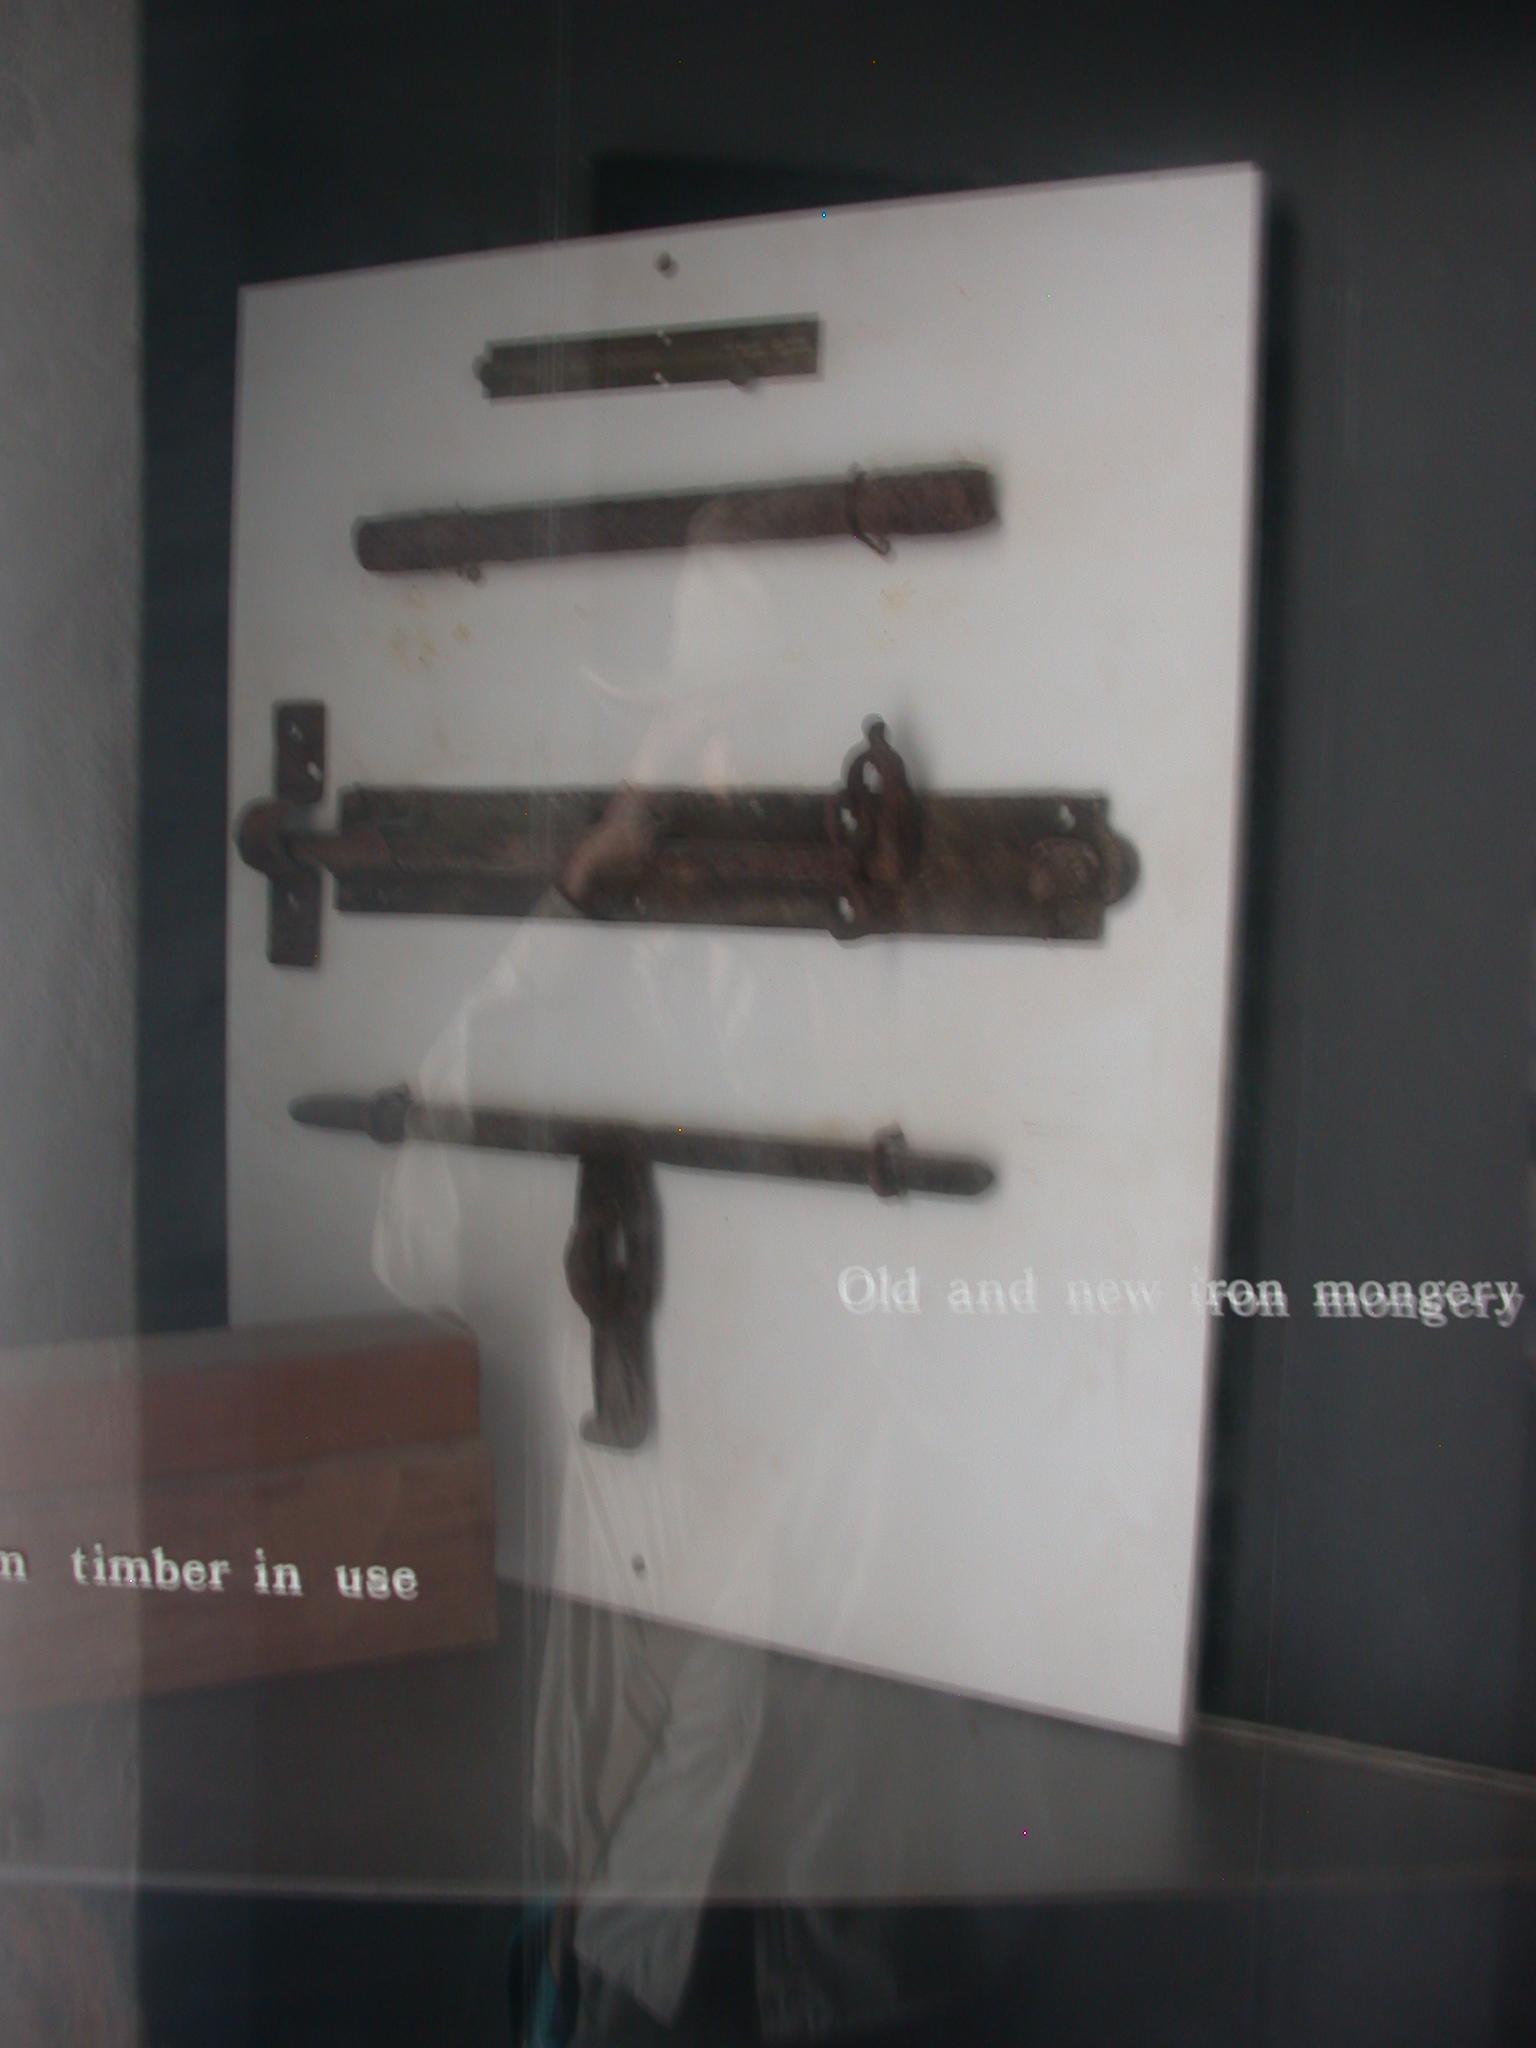 Iron Mongery, Cape Coast Slave Fort Museum, Cape Coast, Ghana